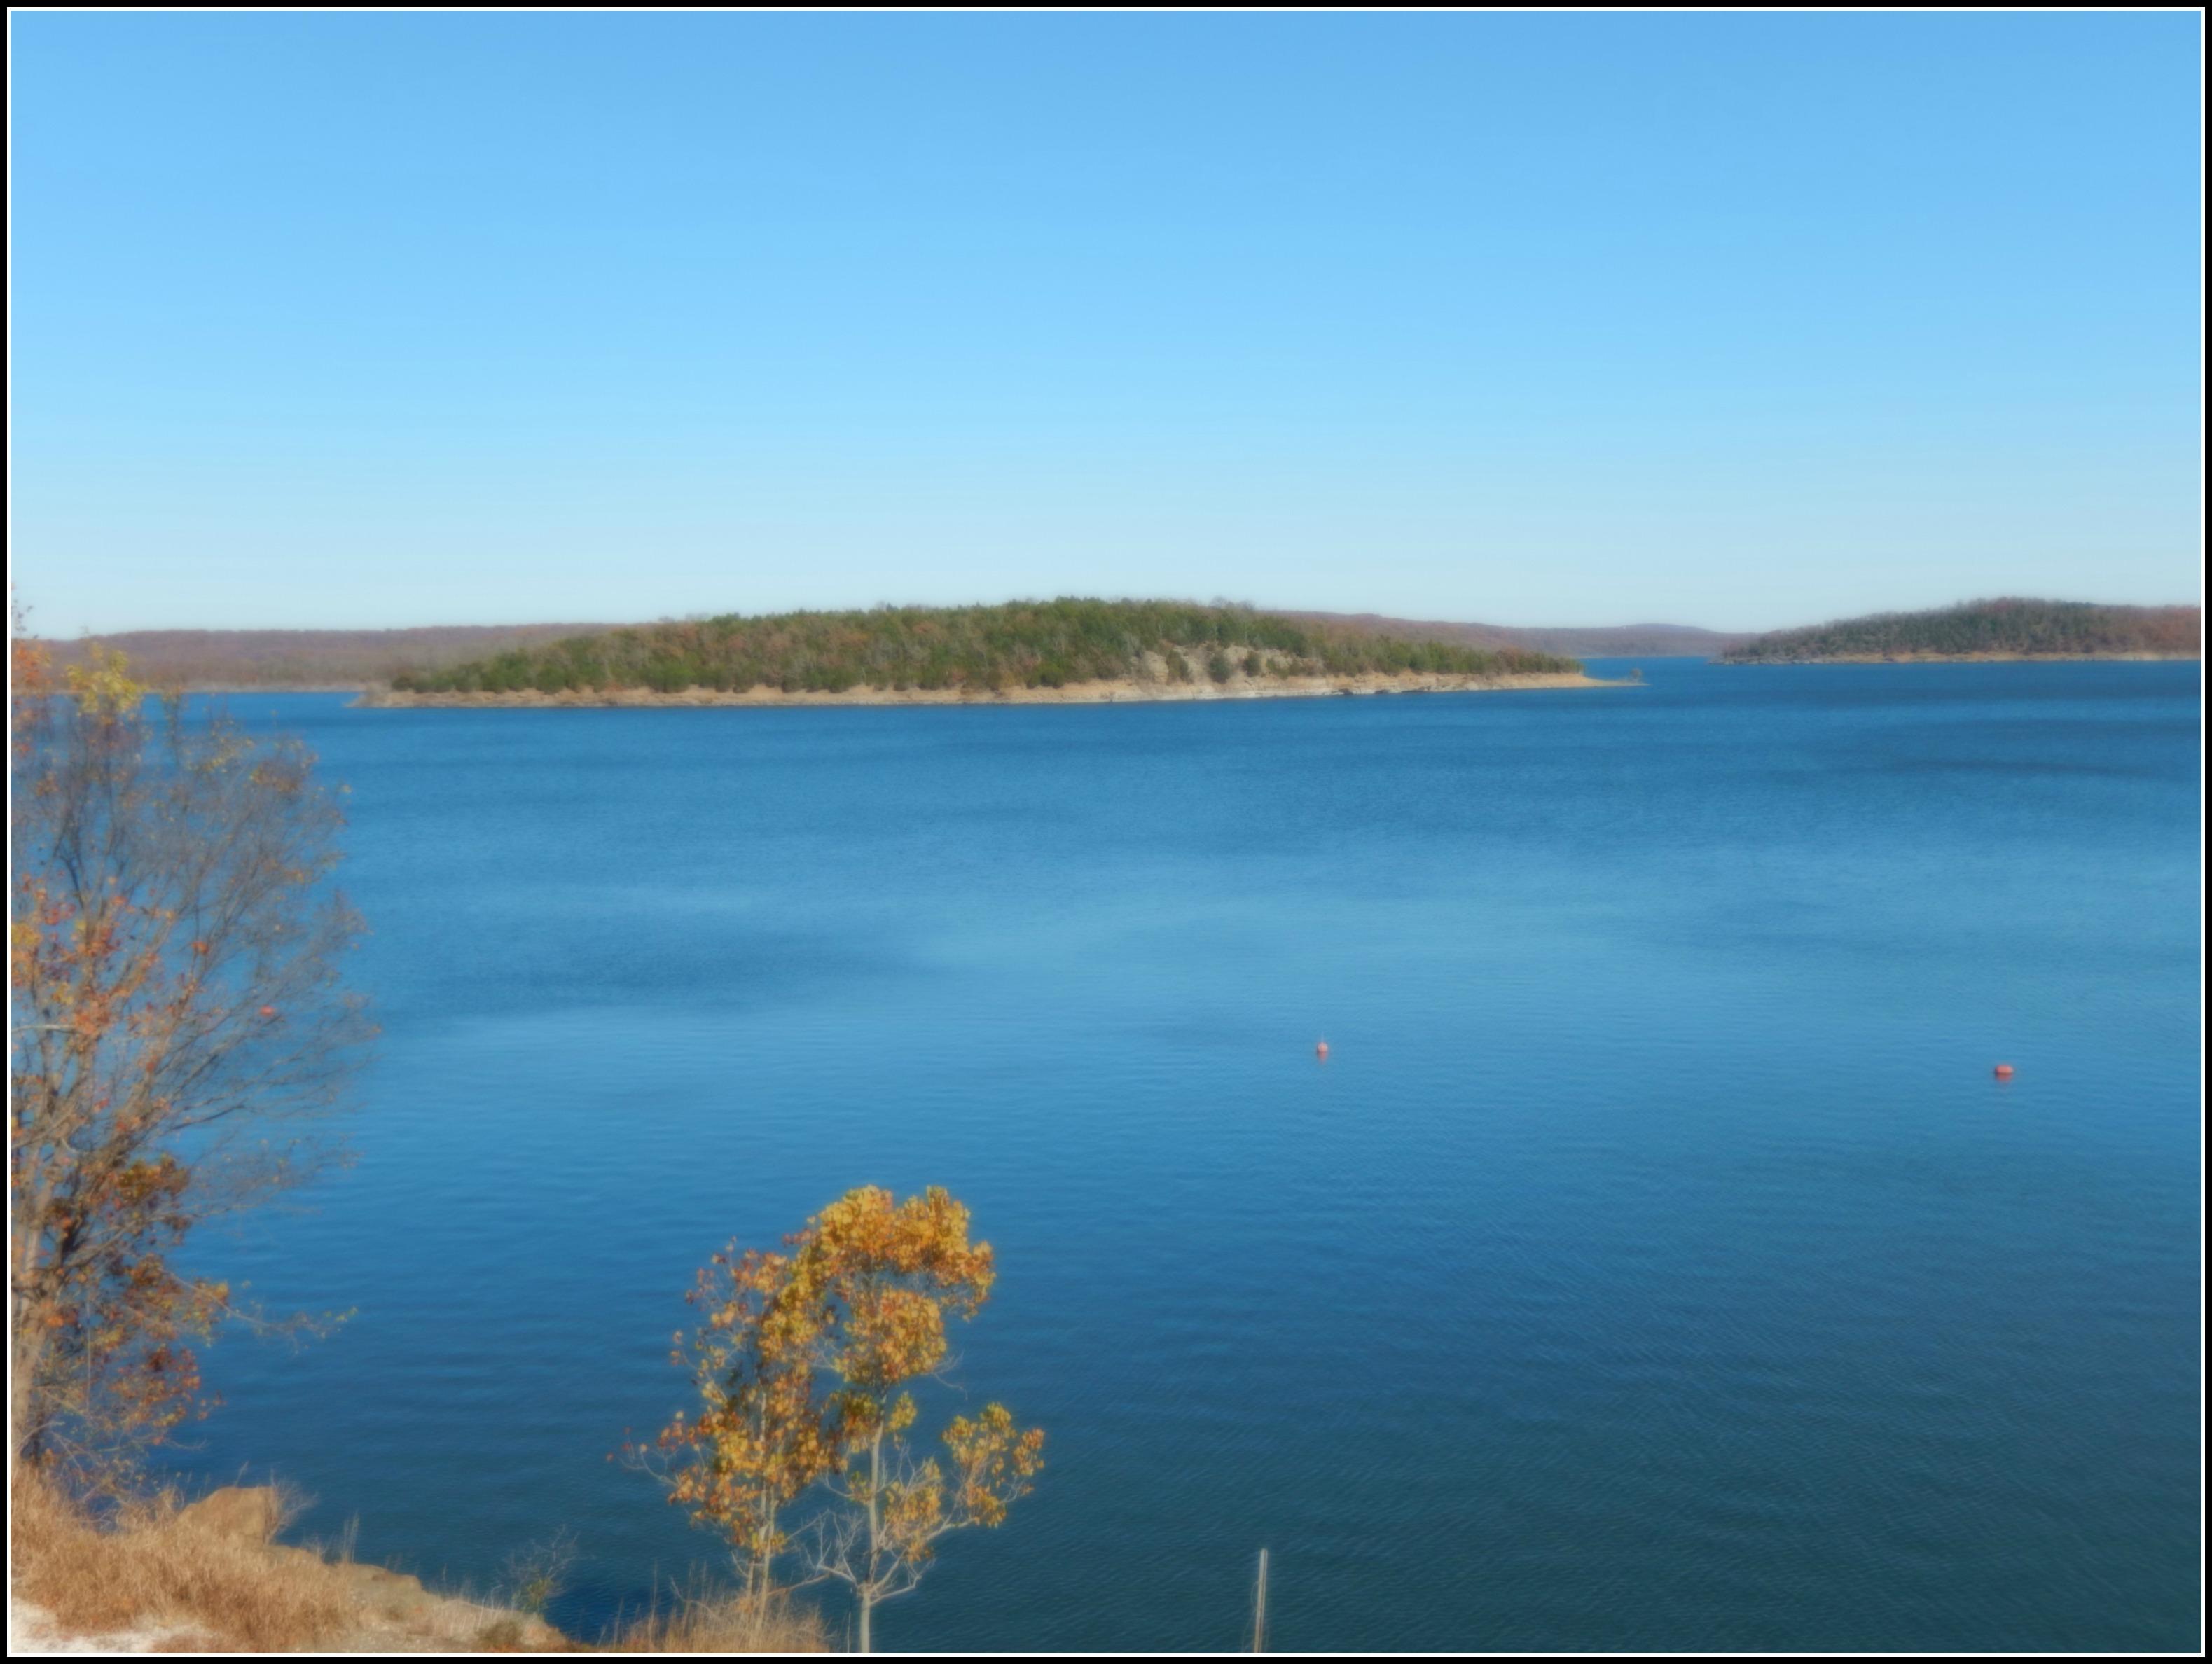 cabins pi lake oklahoma expedition tenkiller